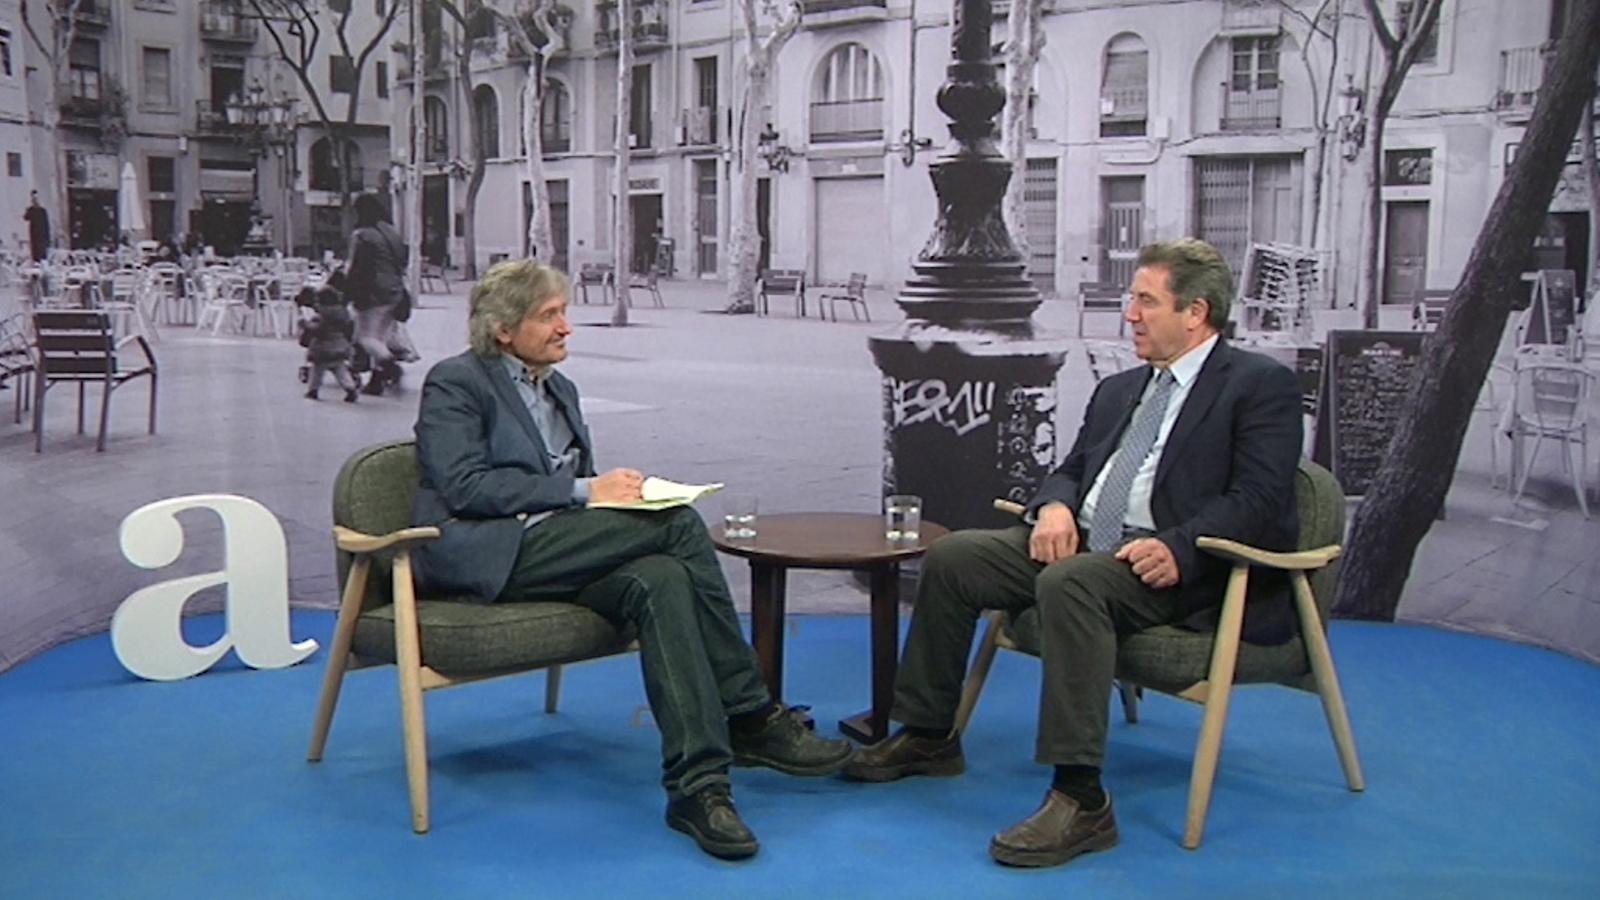 Entrevista de Carles Capdevila a Joan Antoni Melé